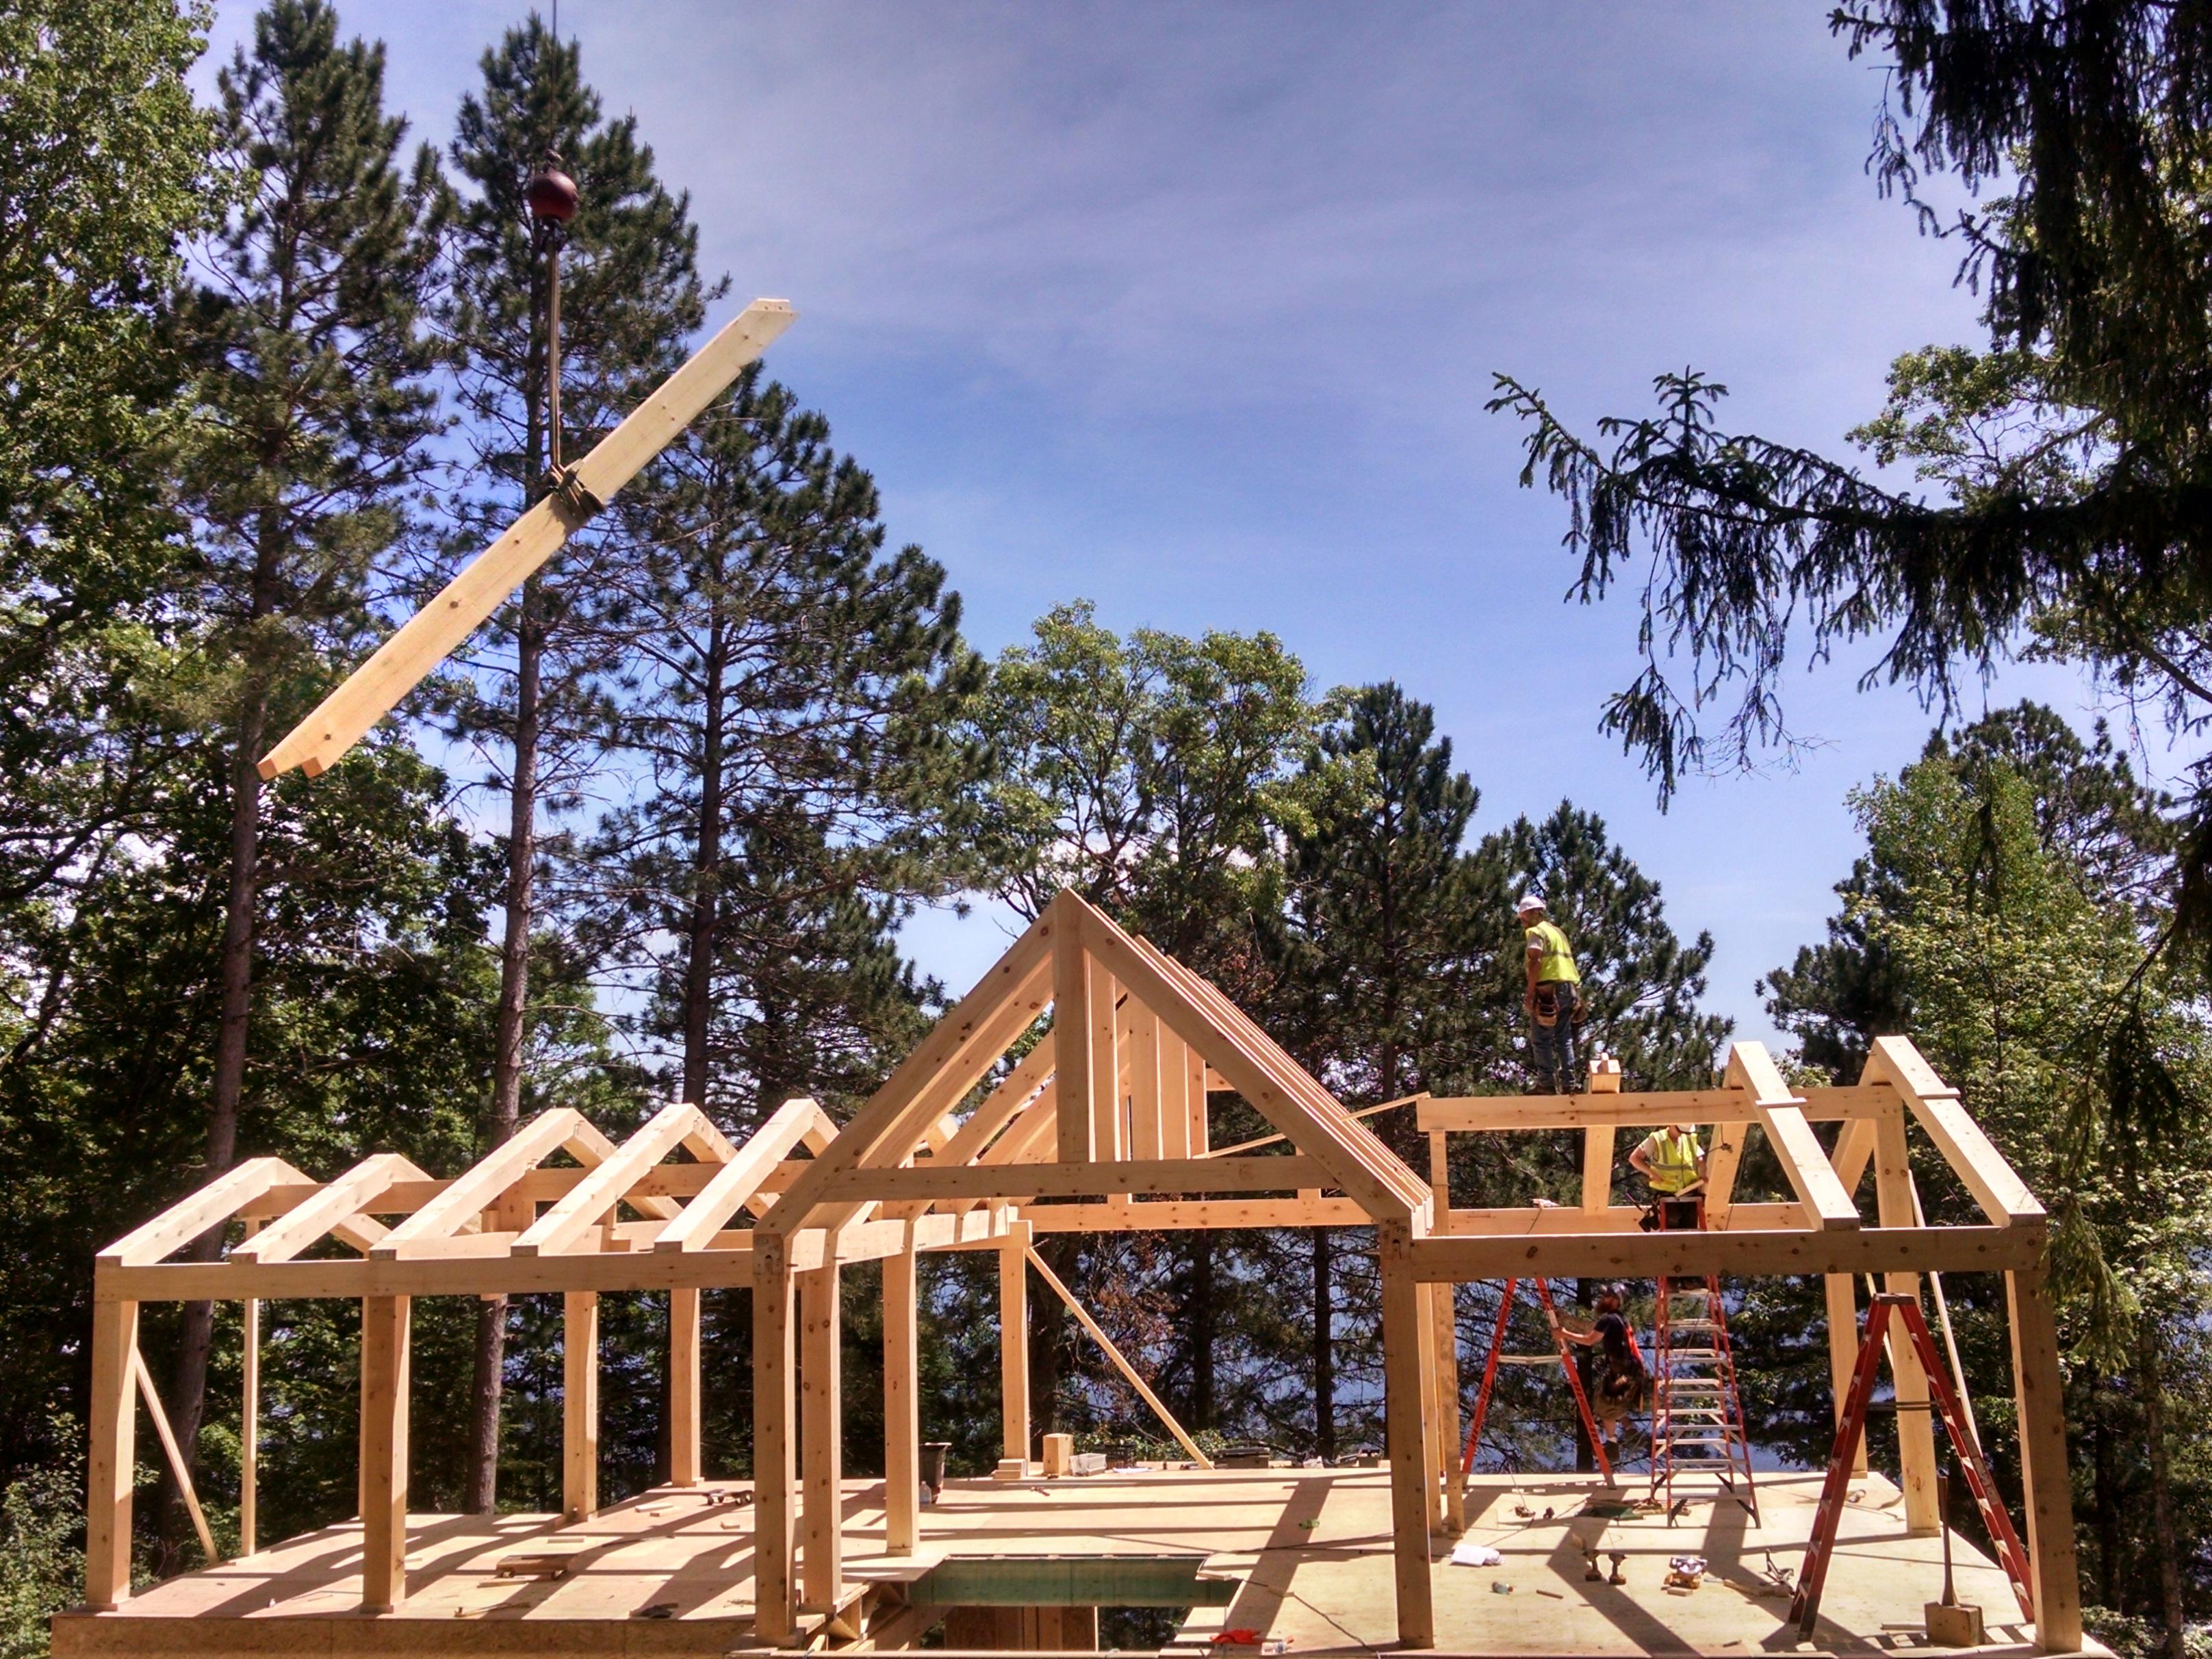 Timber Frame Cabin Floor Plans Timber Frame Raising Ewp Cabin Blue Ox Timber Frames